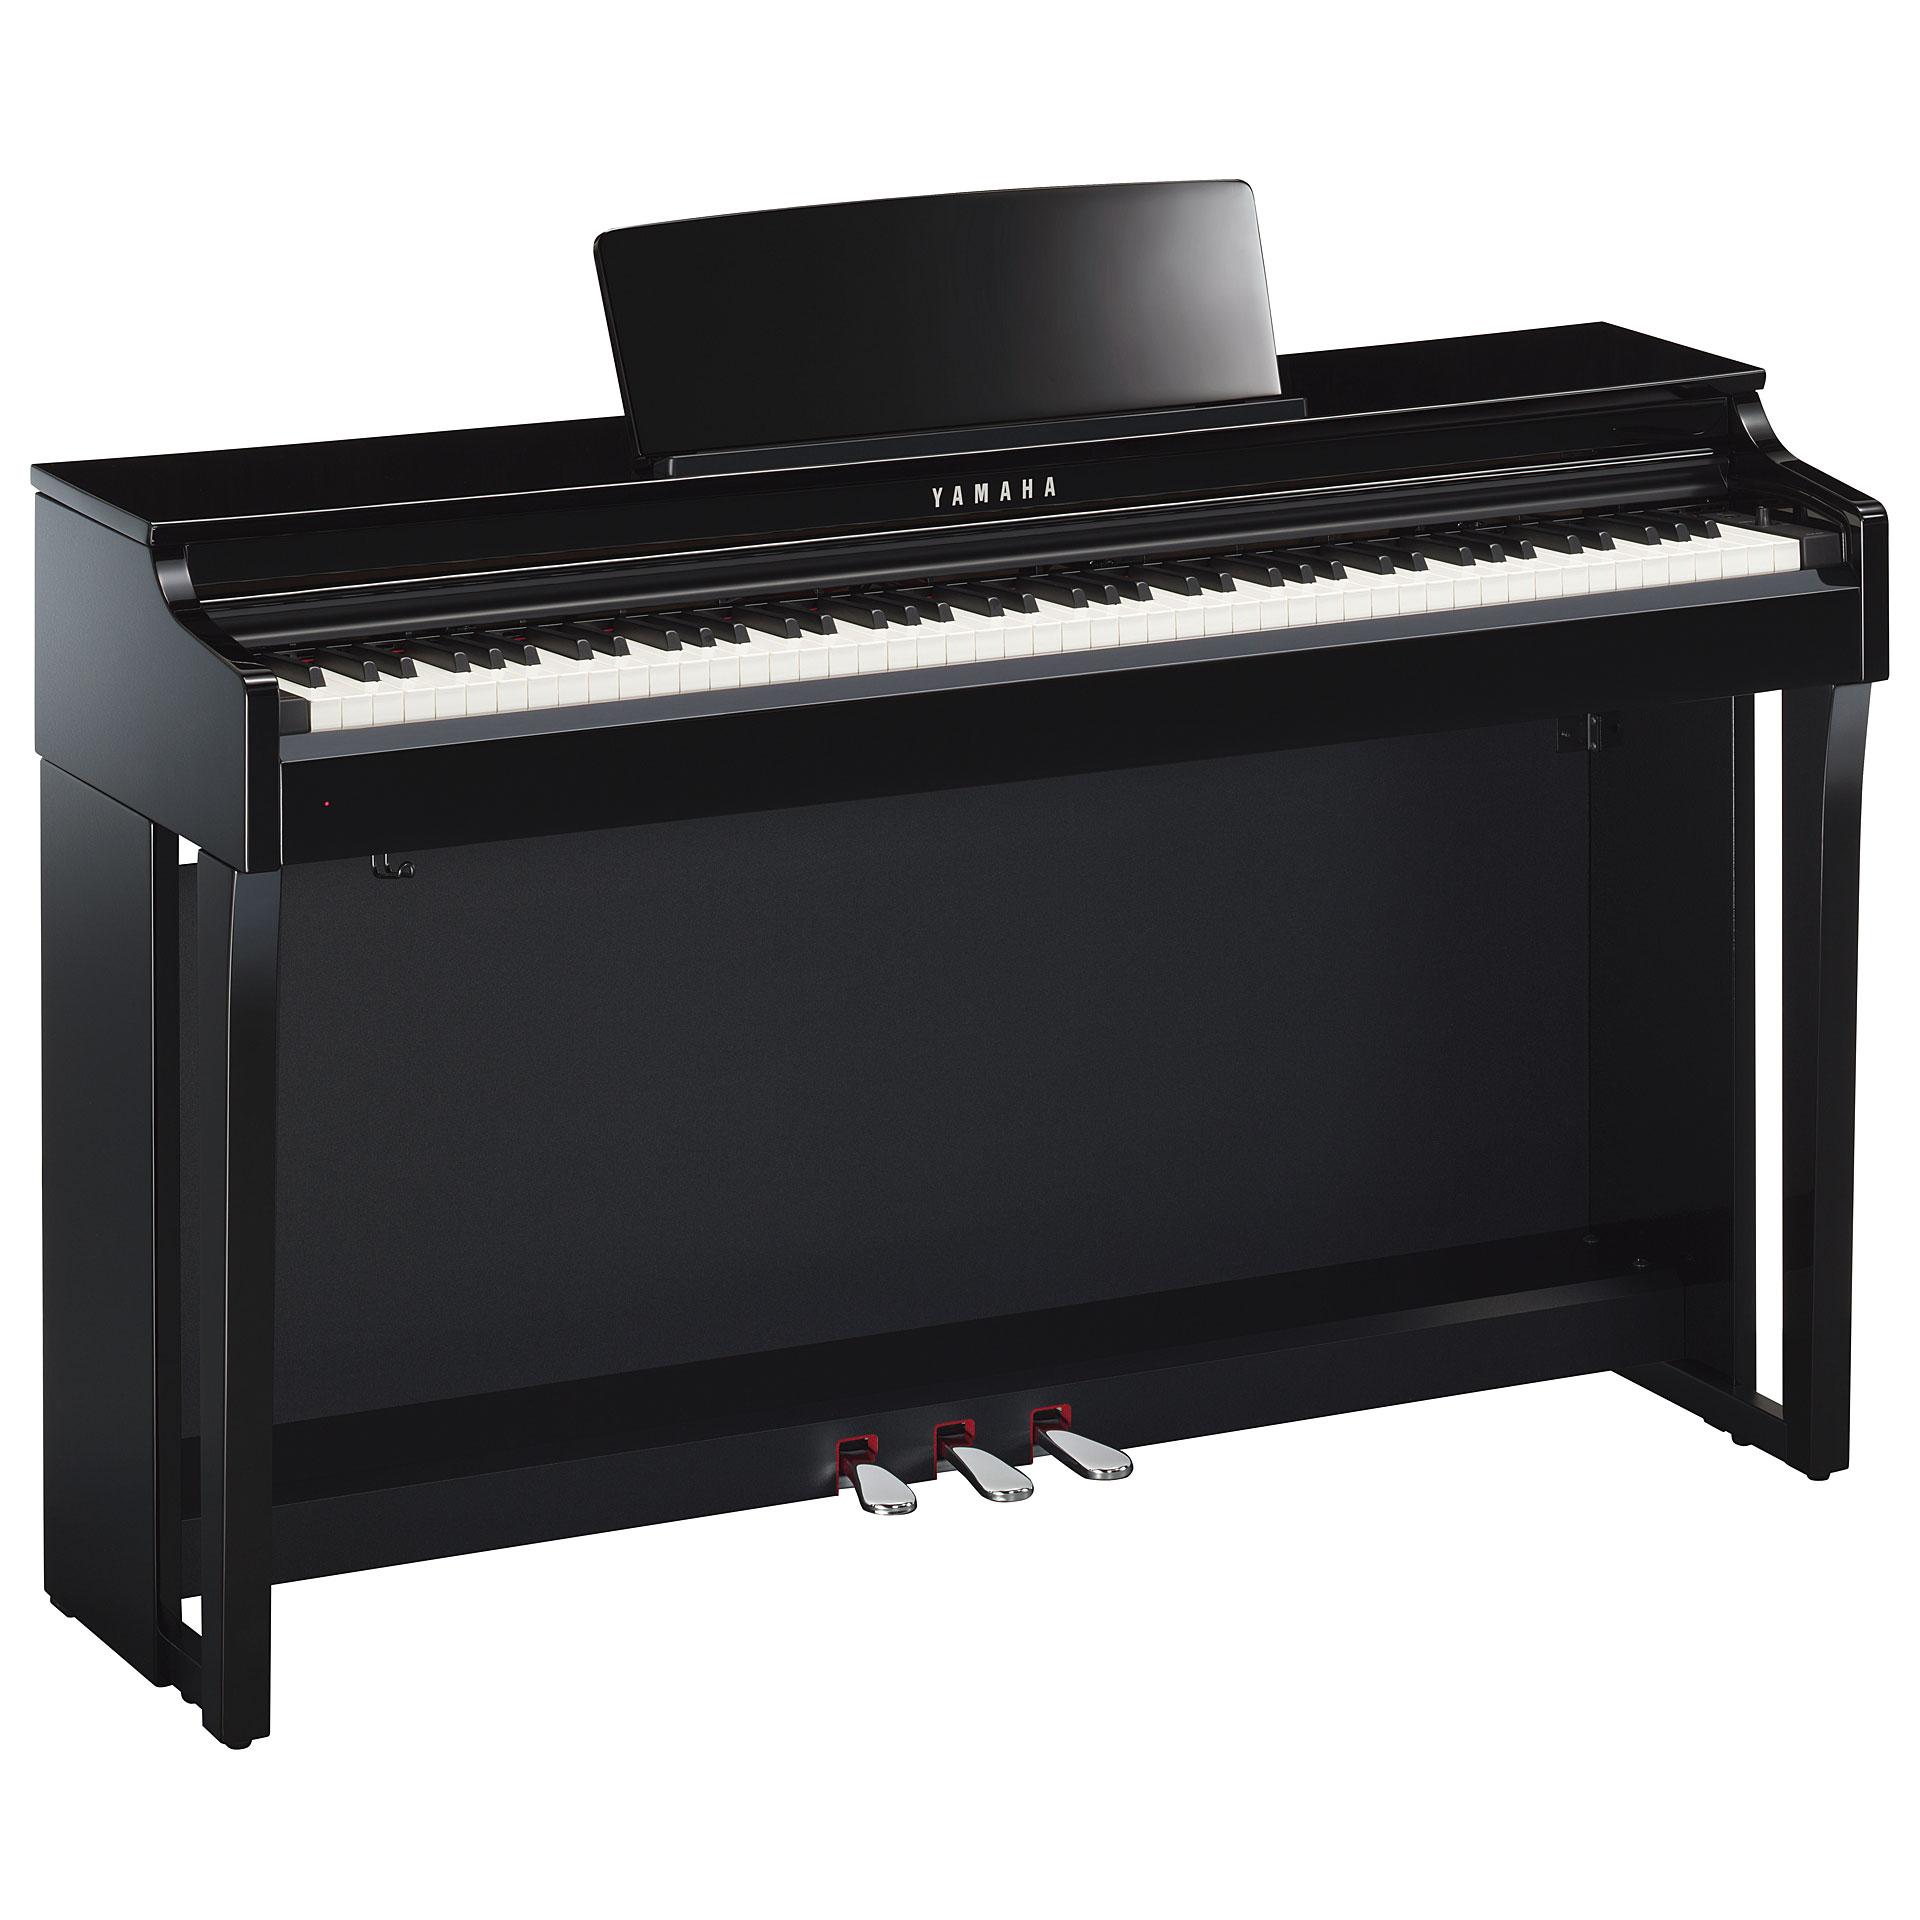 yamaha clavinova clp 625pe digital piano. Black Bedroom Furniture Sets. Home Design Ideas